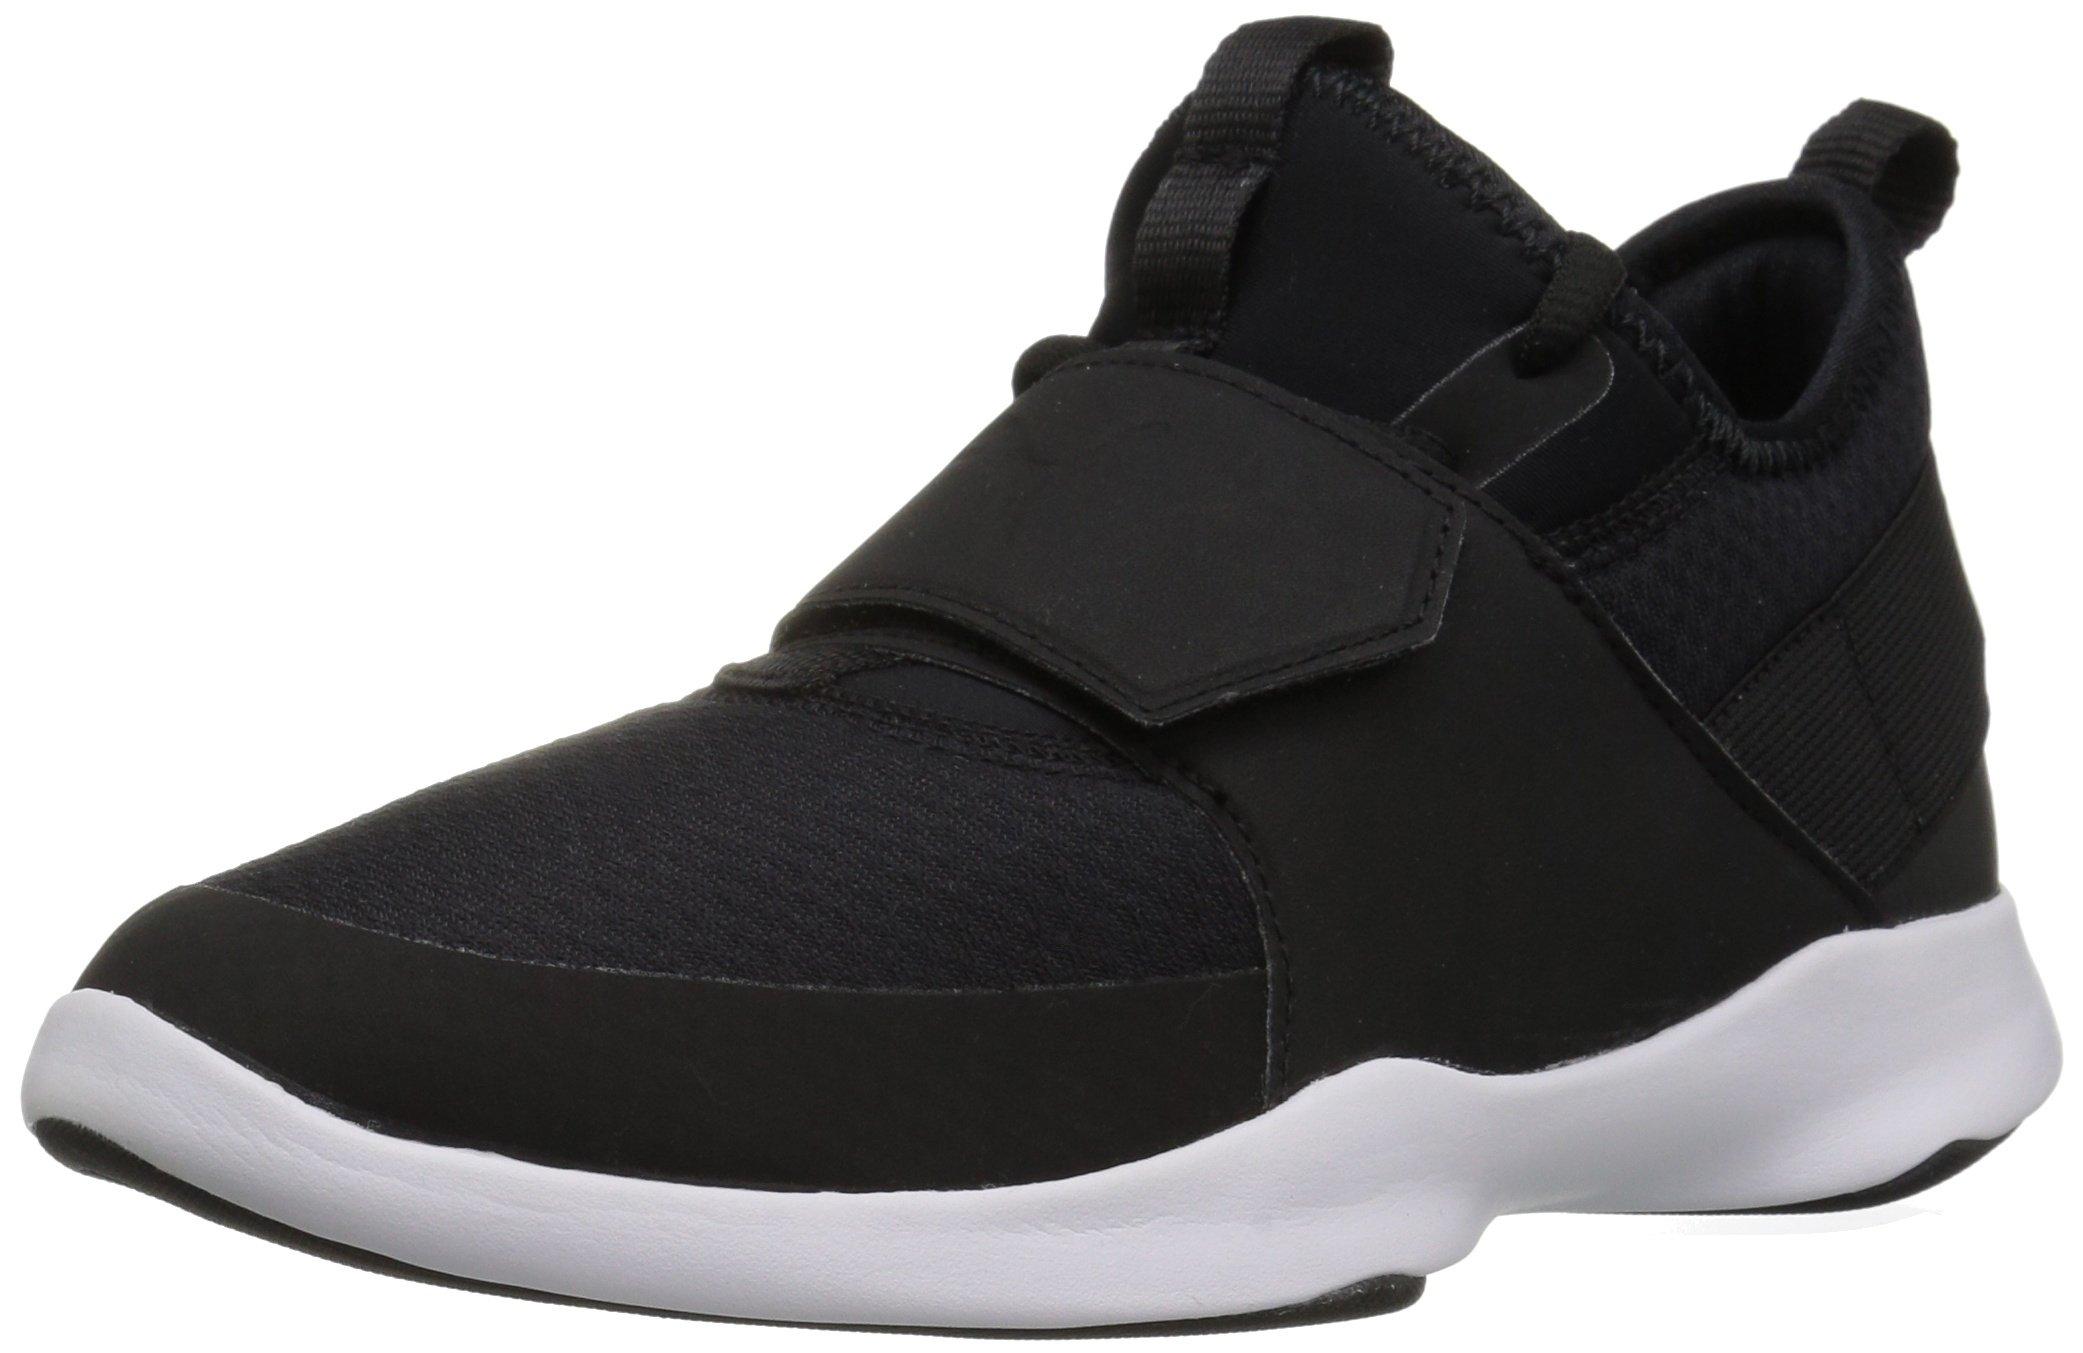 PUMA Unisex Dare Trainer Sneaker, Black Silver, 2 M US Little Kid